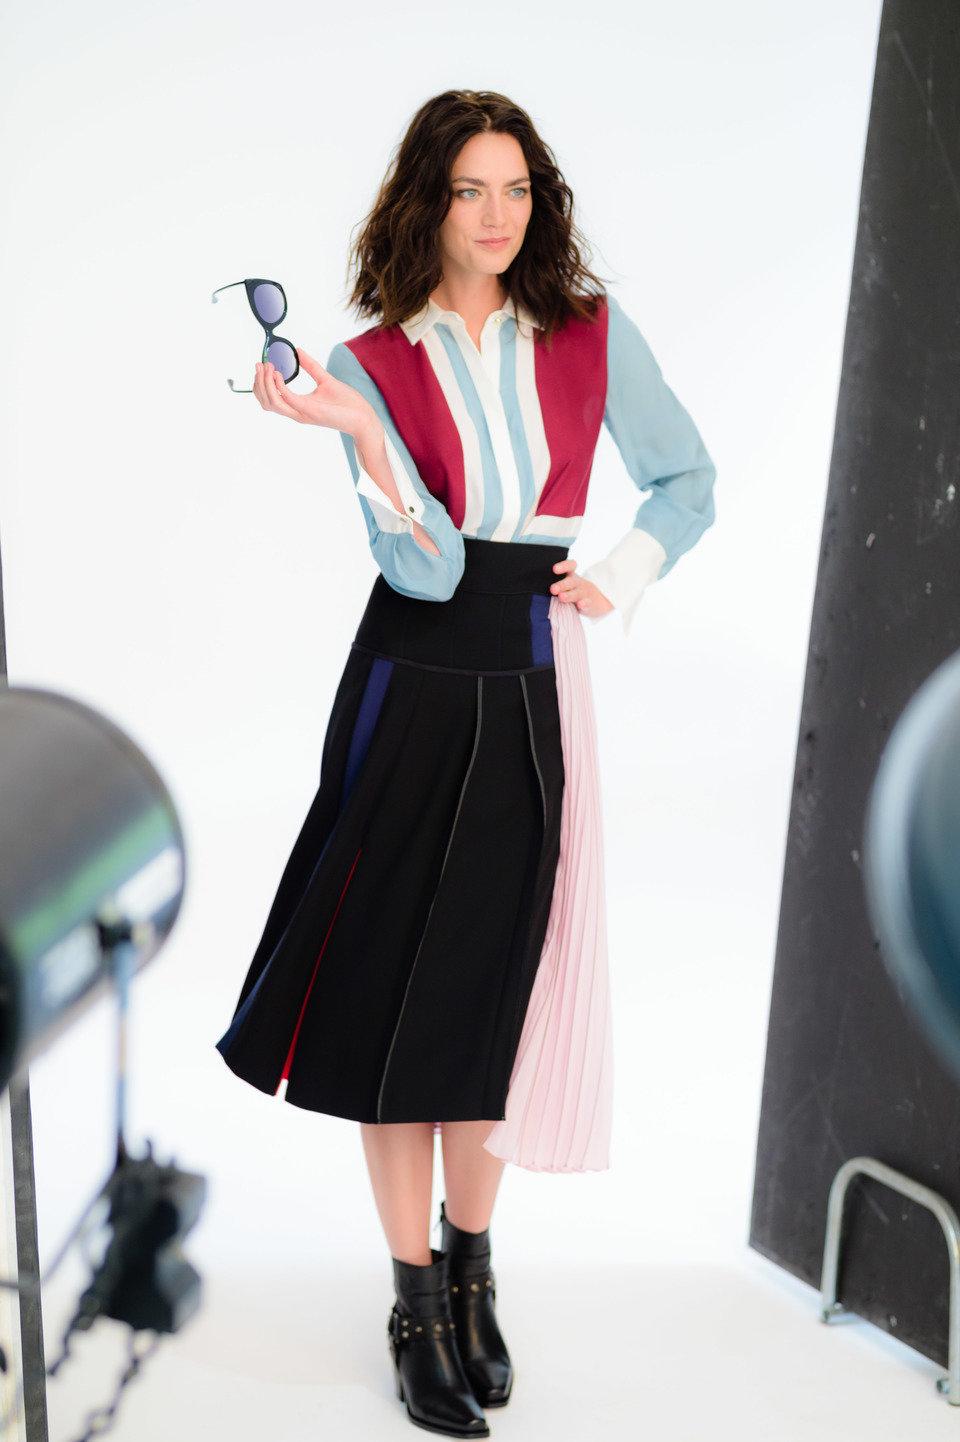 13_KLIF-130718_highres_fotFilipOkopny-FashionImages.JPG